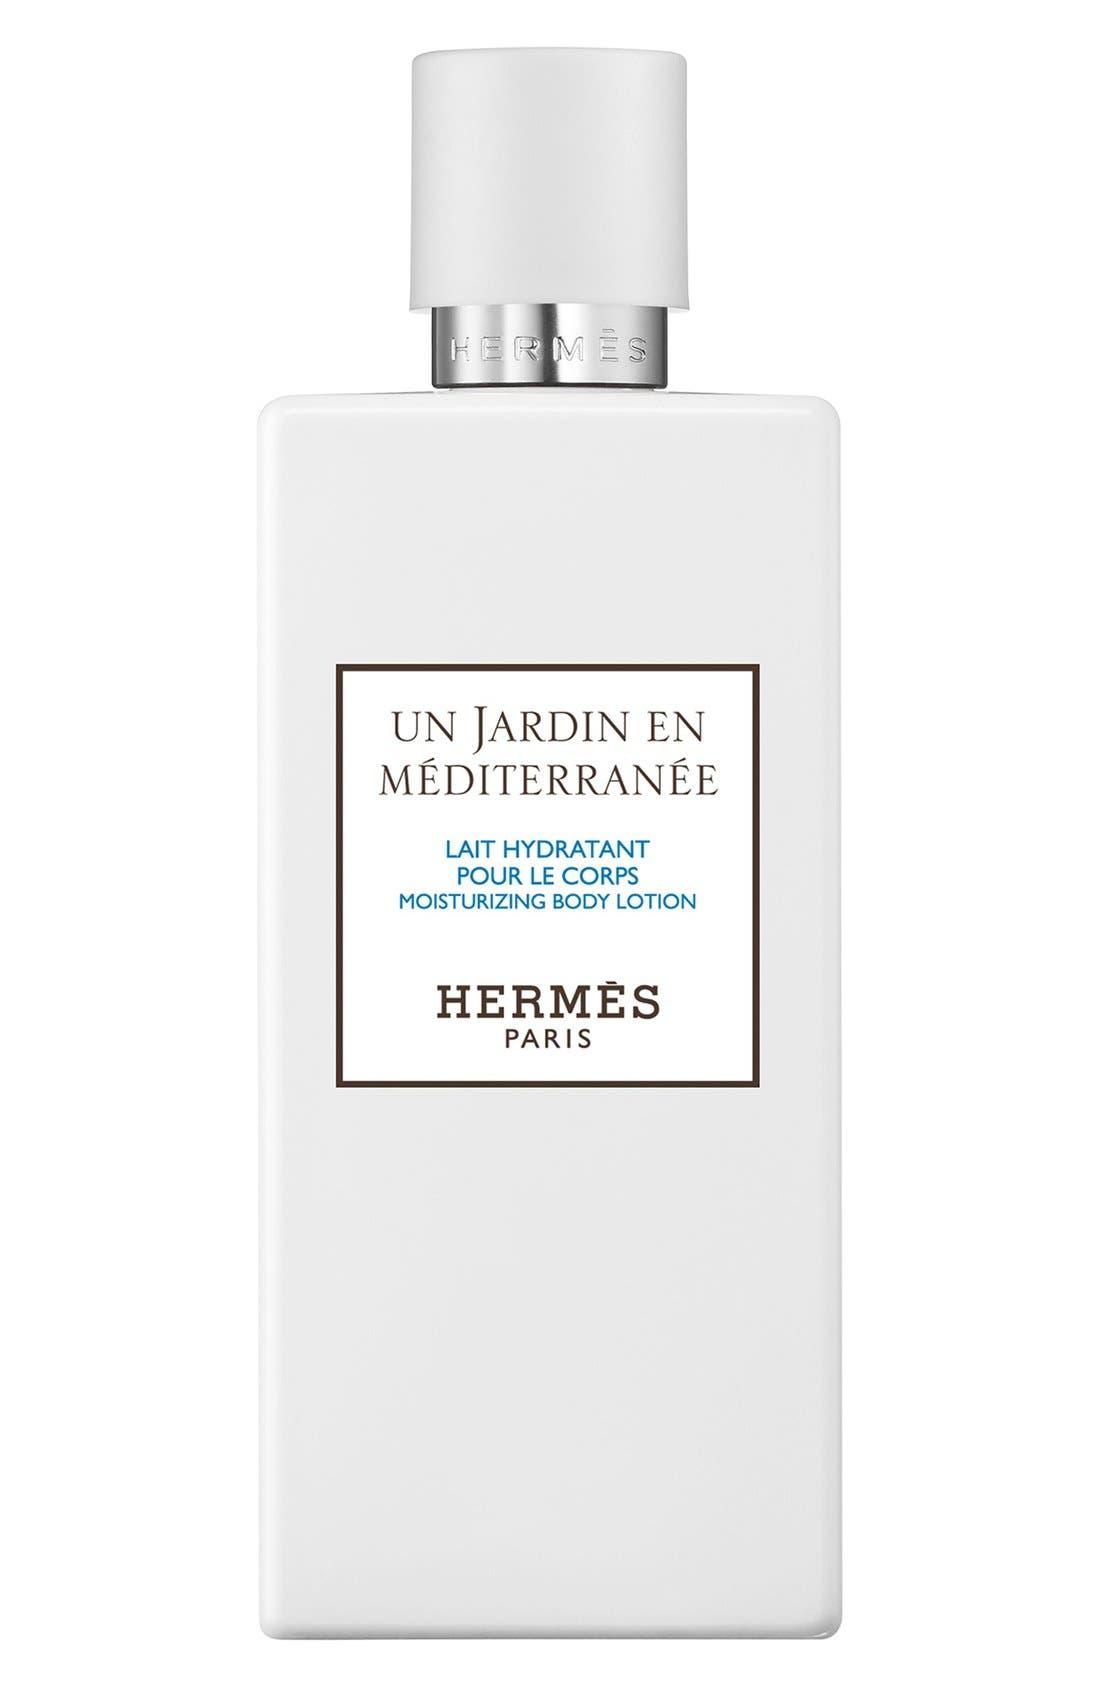 Hermès Le Jardin en Méditerranée - Moisturizing body lotion